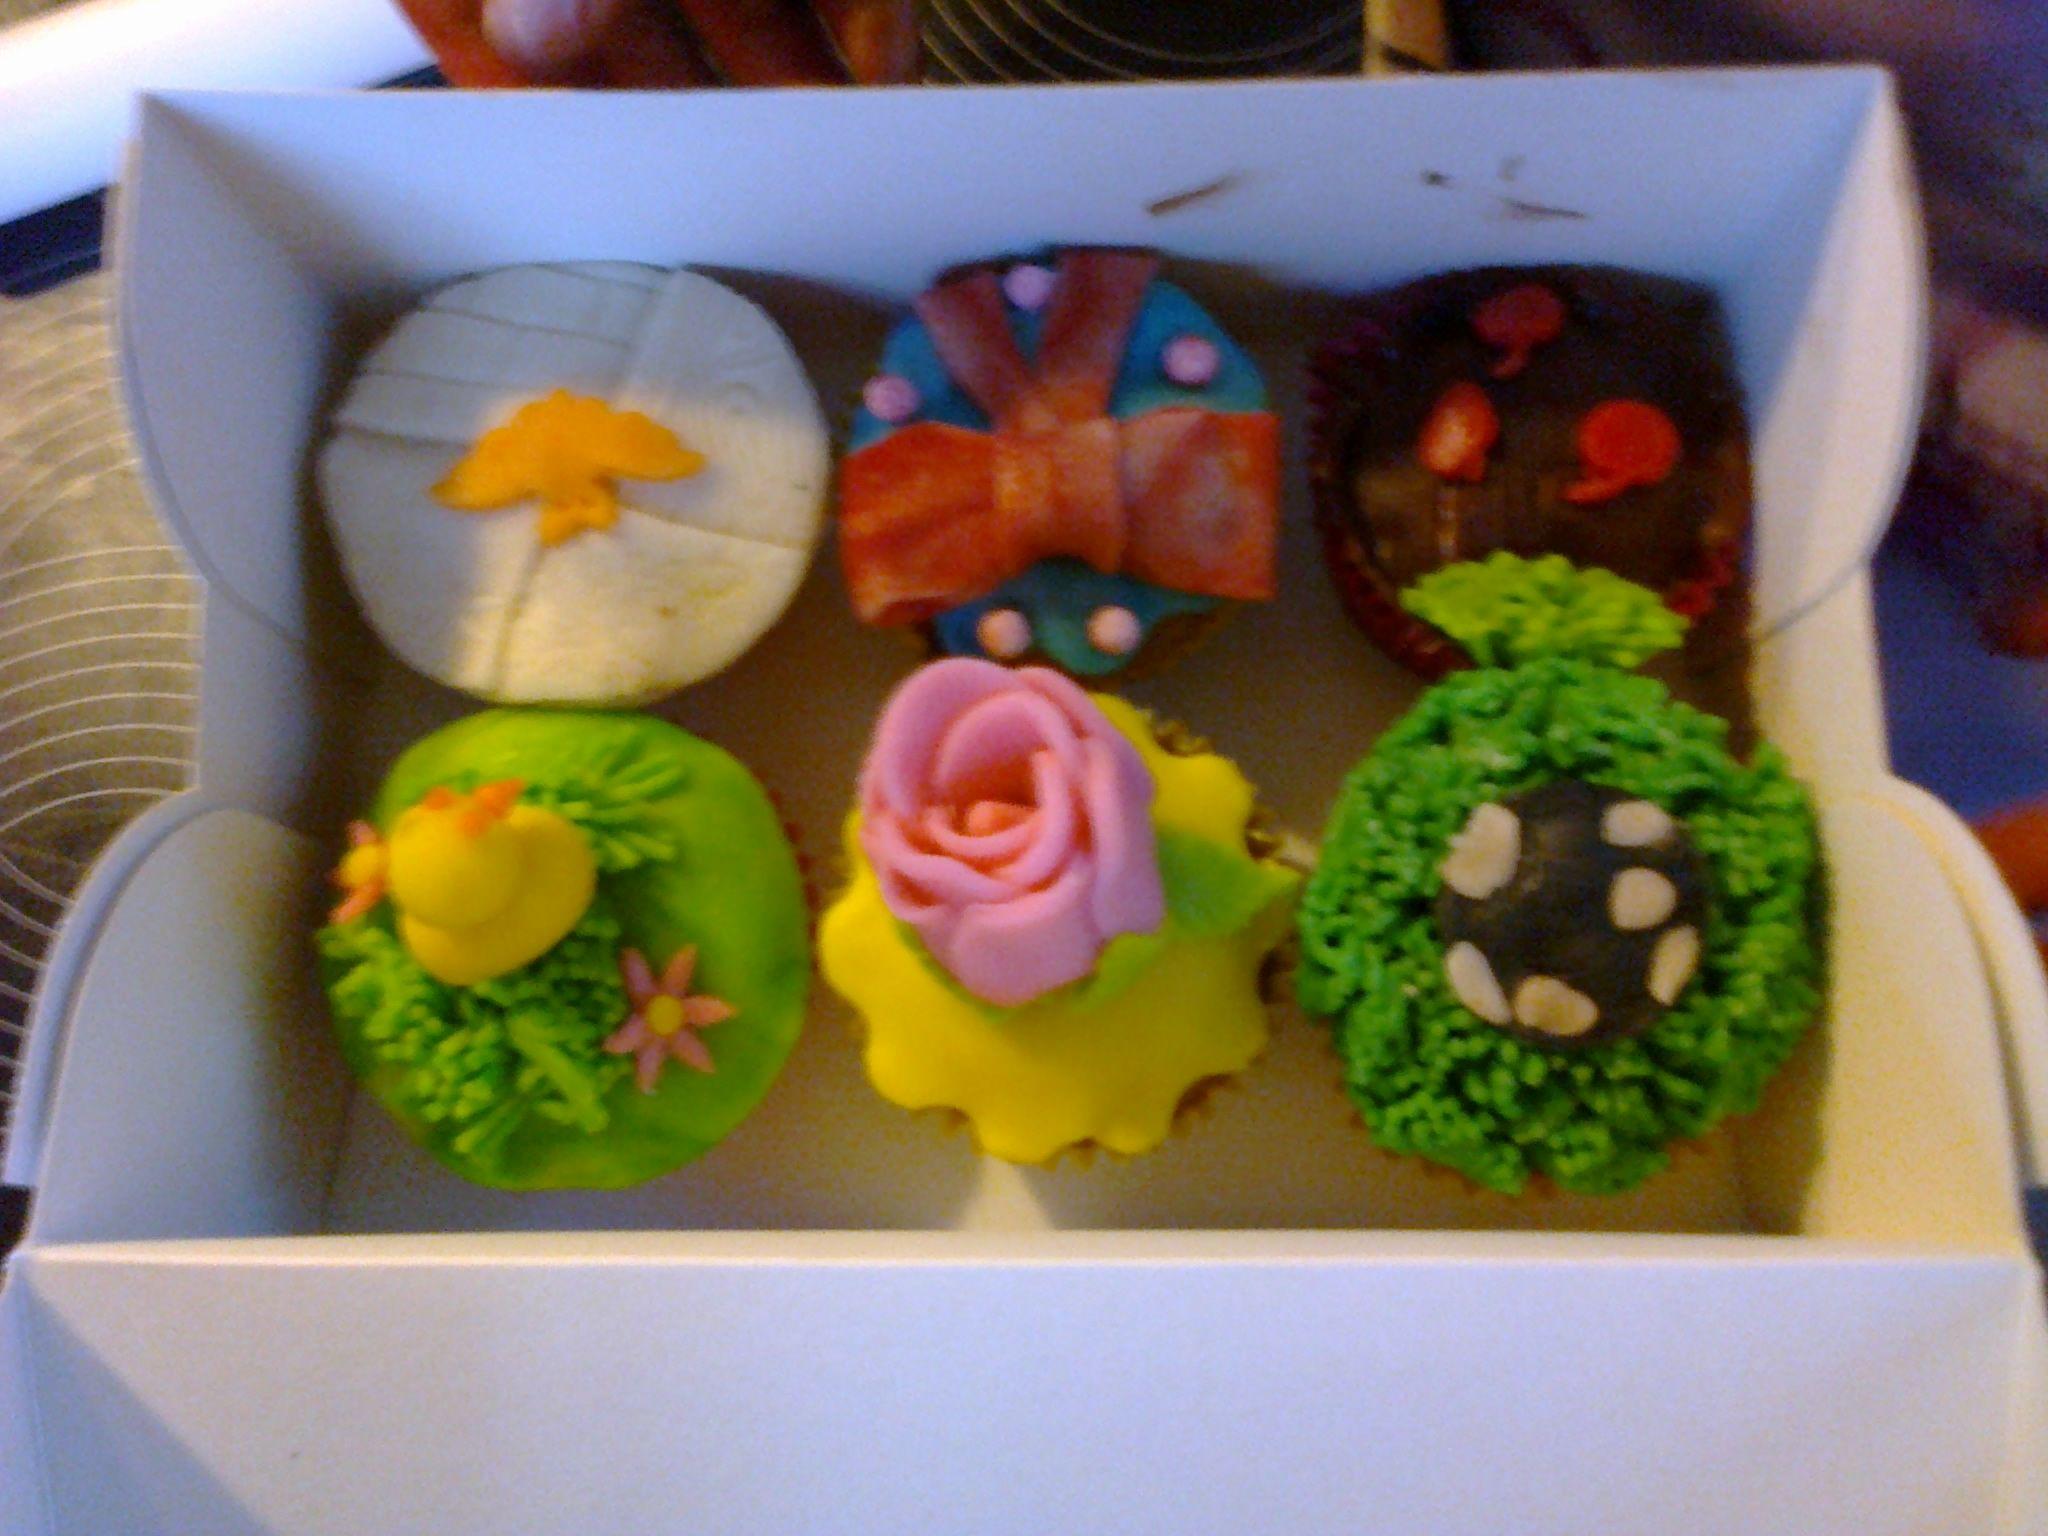 resultaat kinderfeestje cupcake versieren cupcakes pinterest cup cakes cups and cake. Black Bedroom Furniture Sets. Home Design Ideas